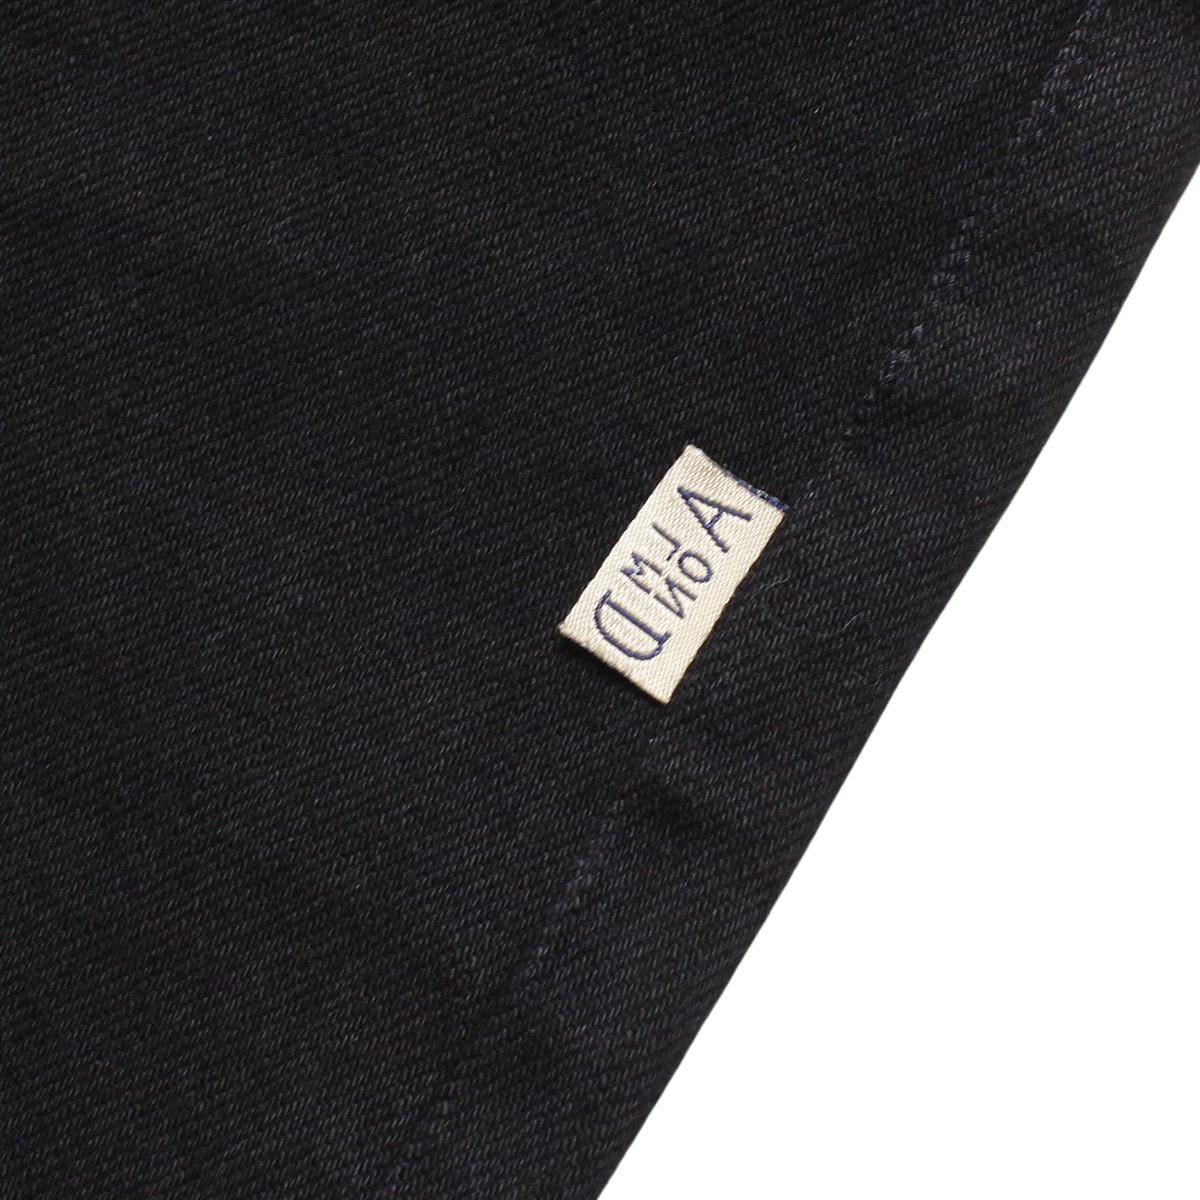 Almond Surf アーモンドサーフボードデザイン BLACK DENIM PANTS